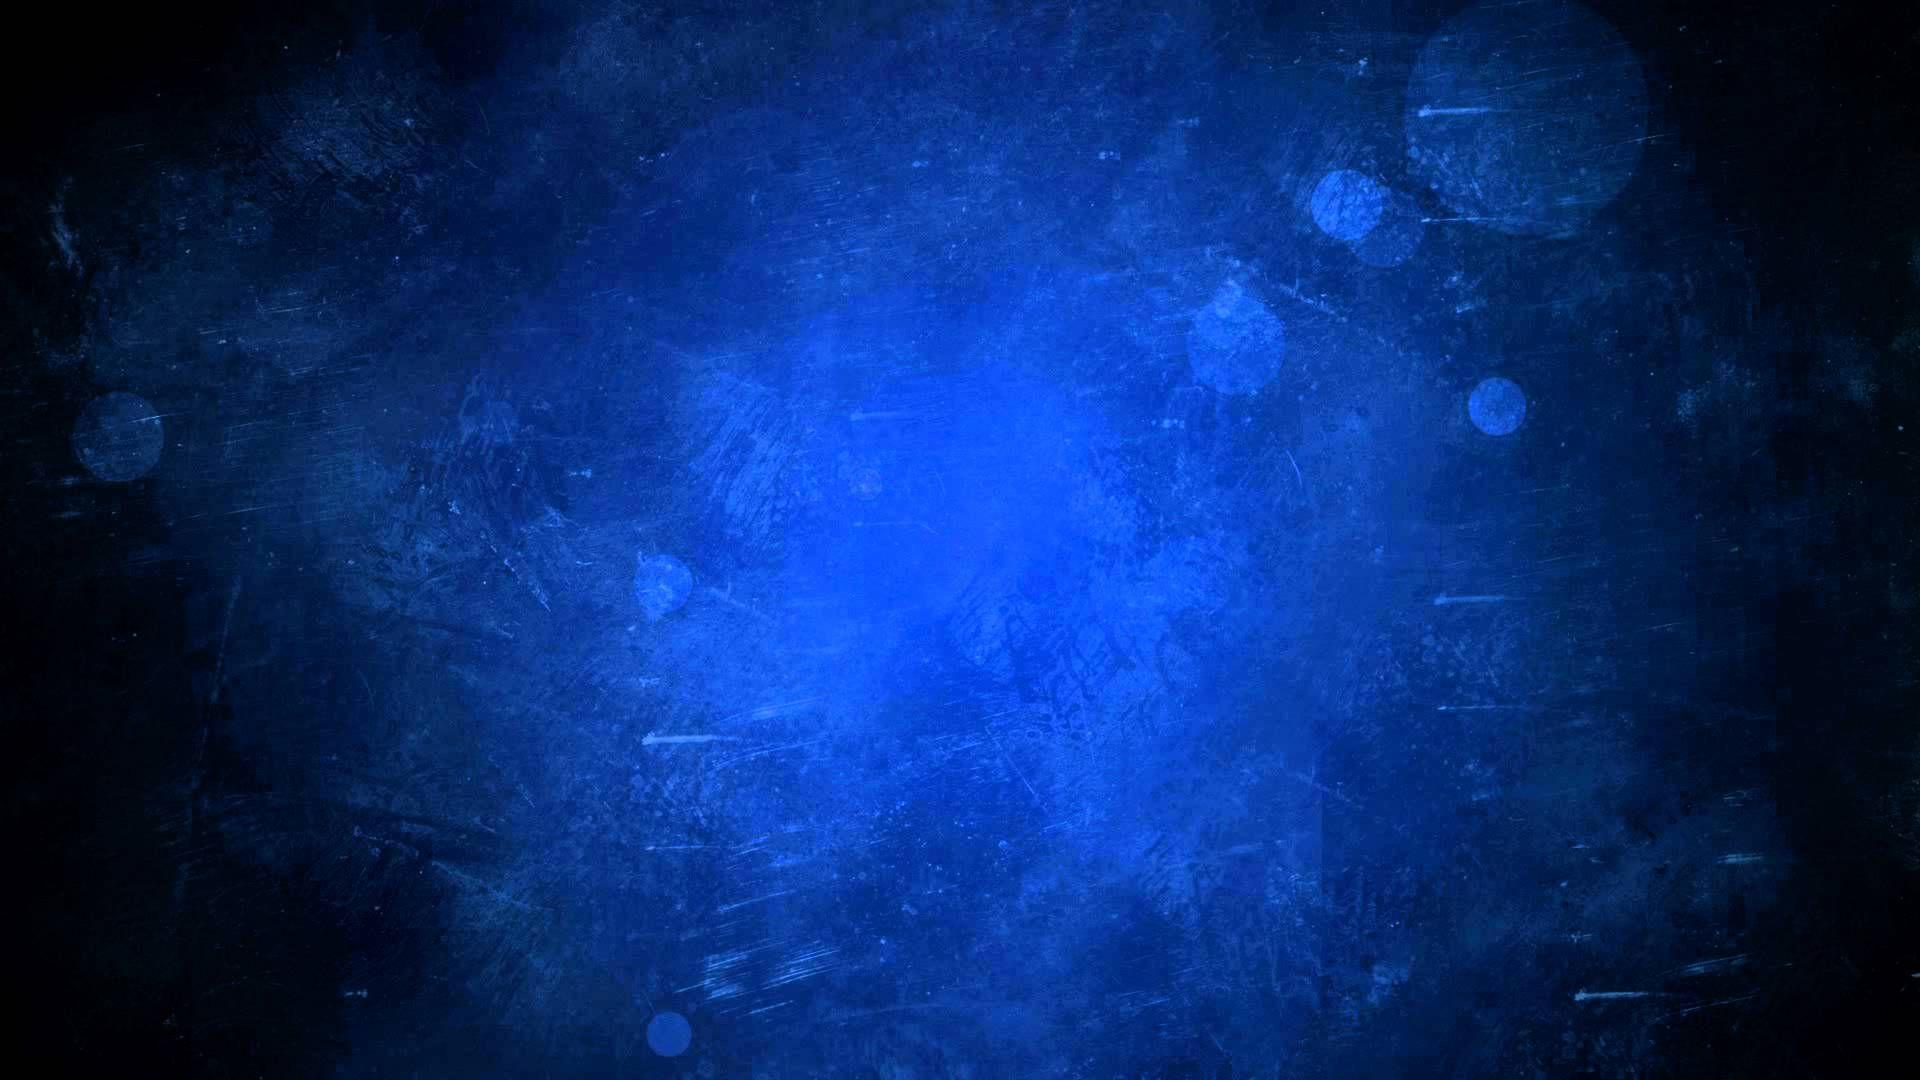 Simple Blue   HD Motion Graphics Background Loop Loops 1920x1080